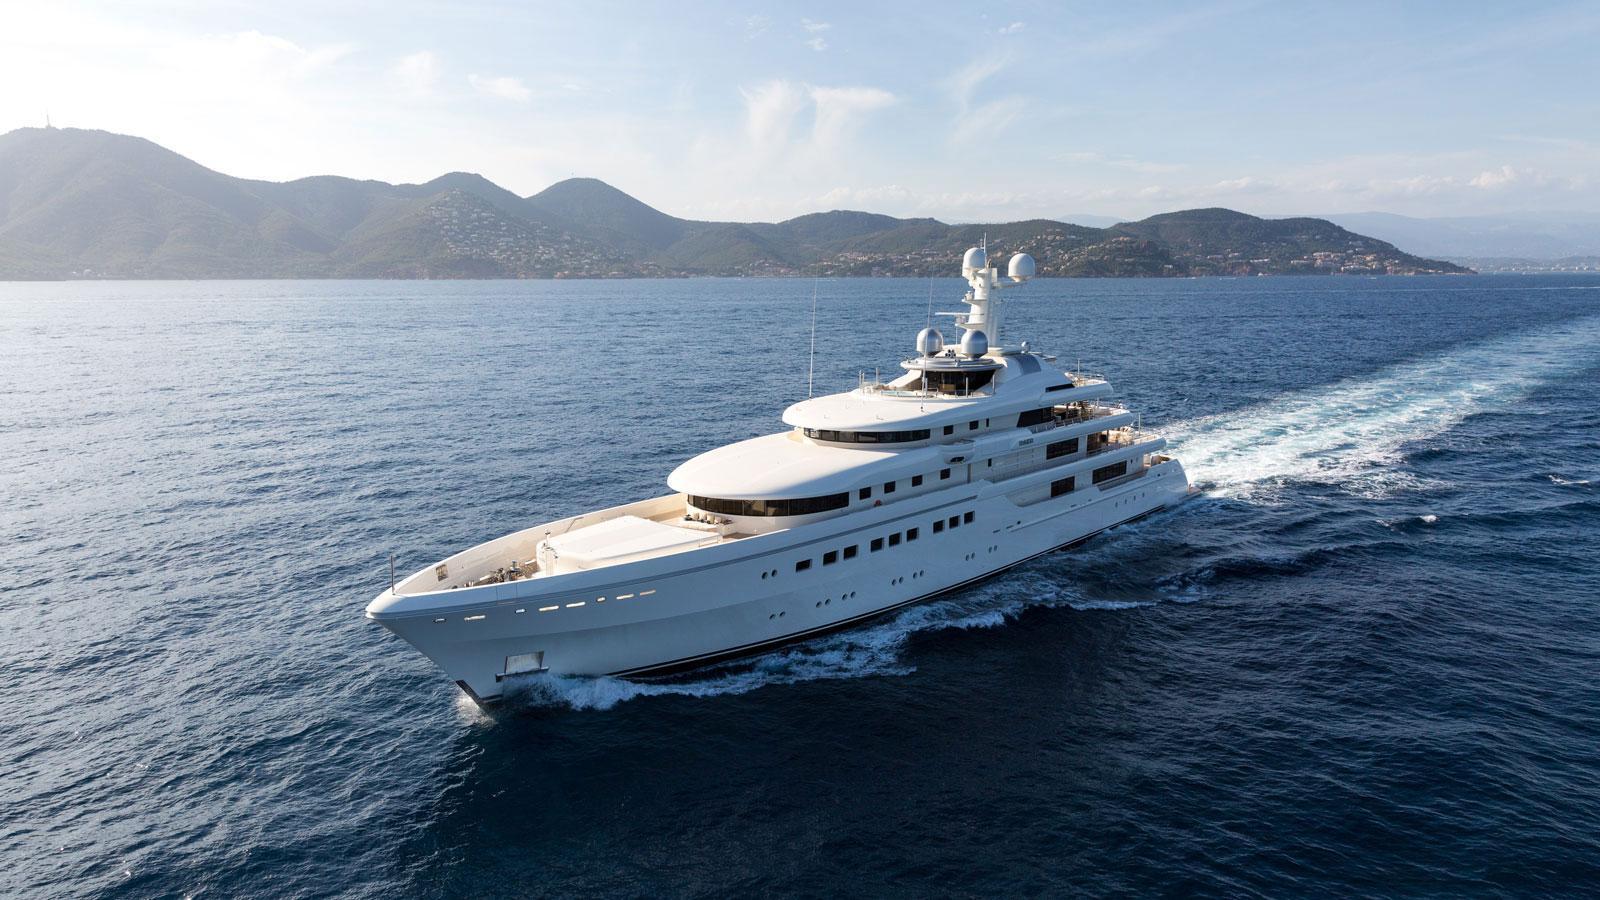 romea-motor-yacht-abeking-rasmussen-2015-82m-aerial-cruising